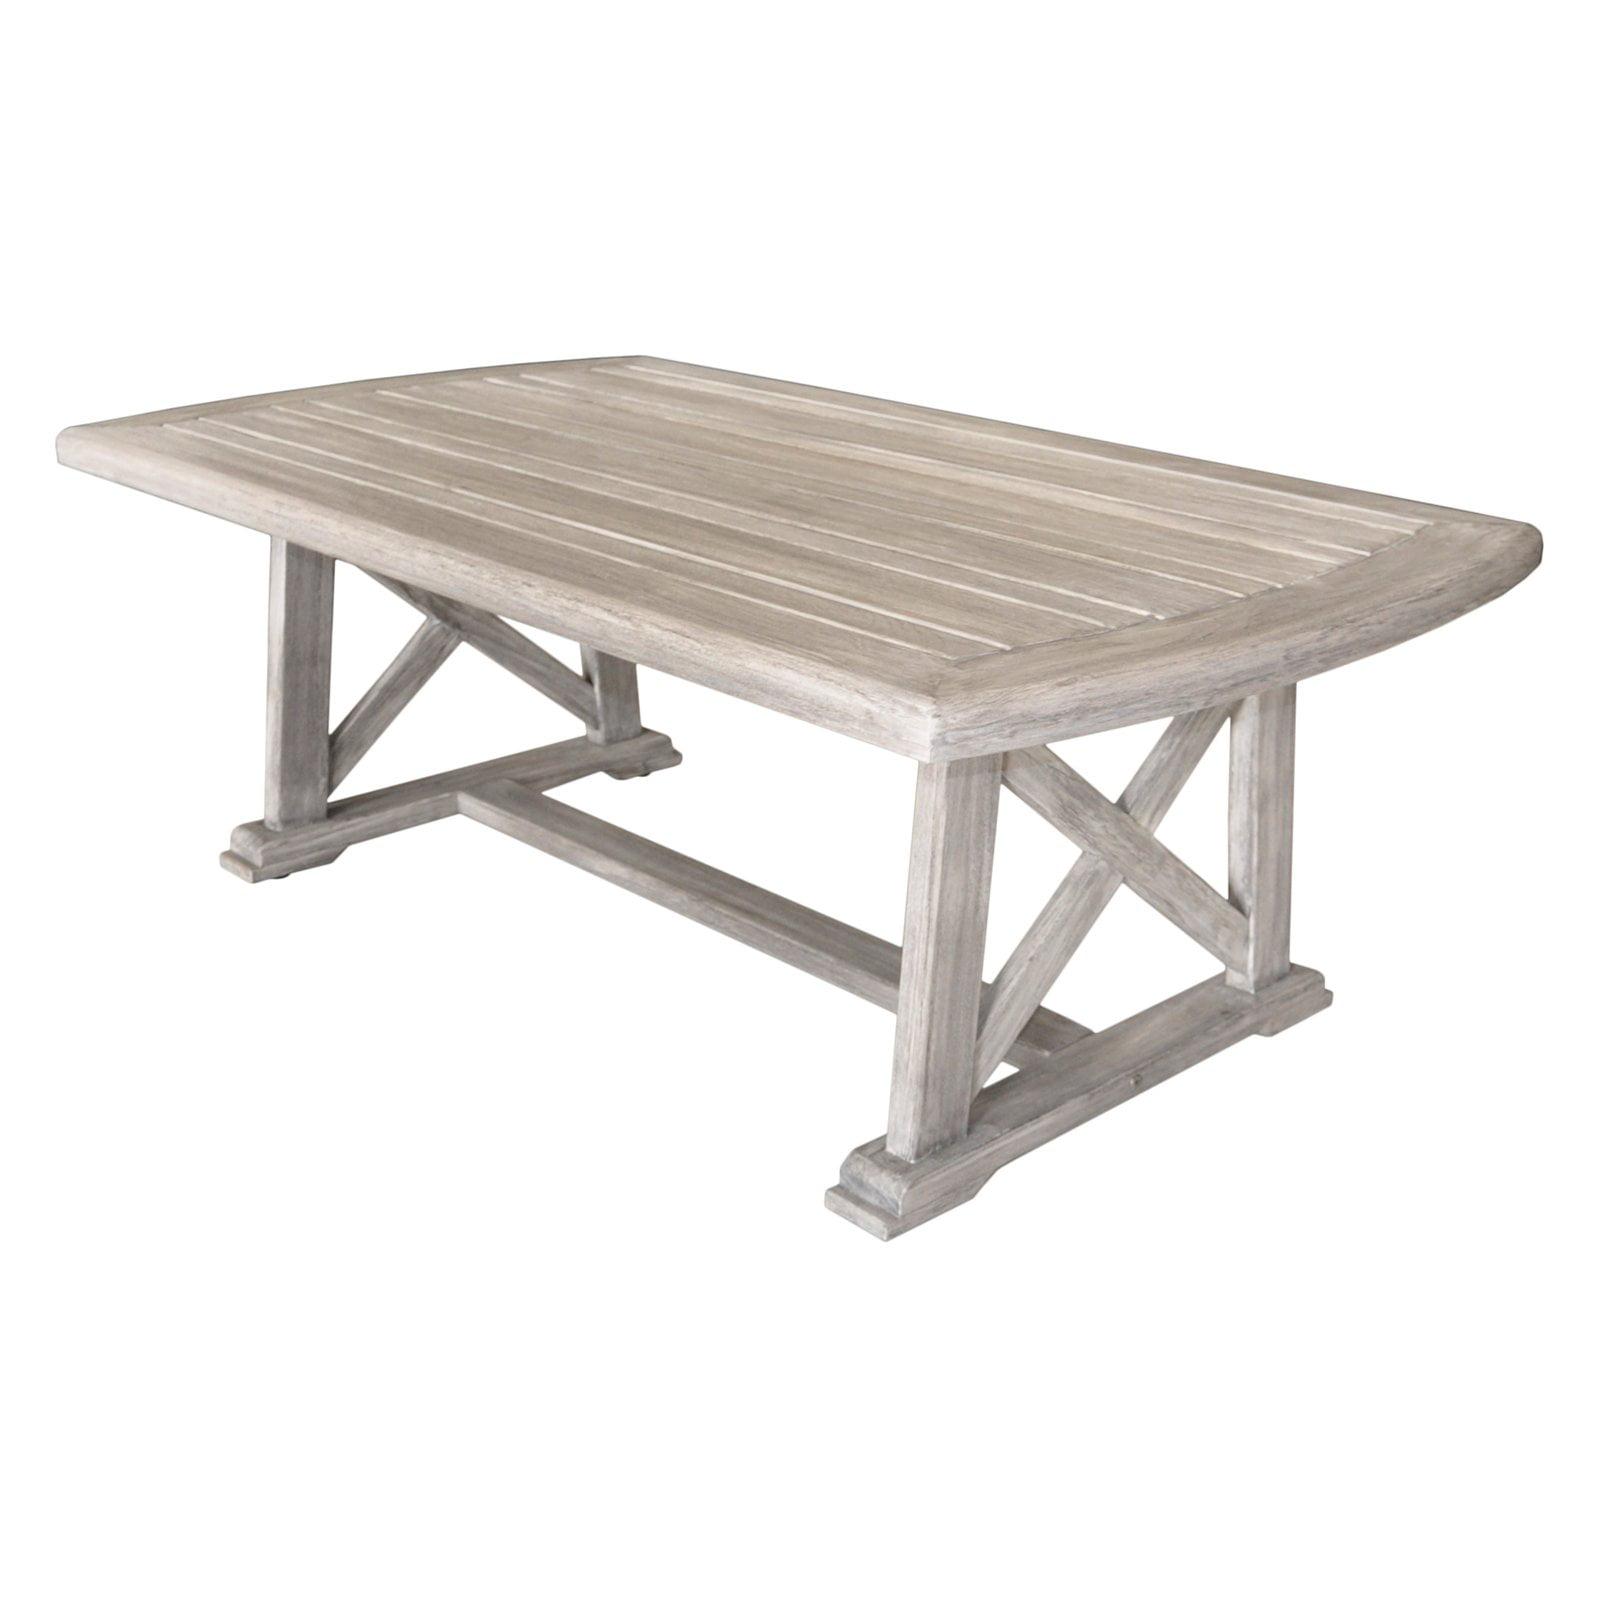 Grey Teak Coffee Table: Driftwood Gray Teak Surf Side Outdoor Coffee Table